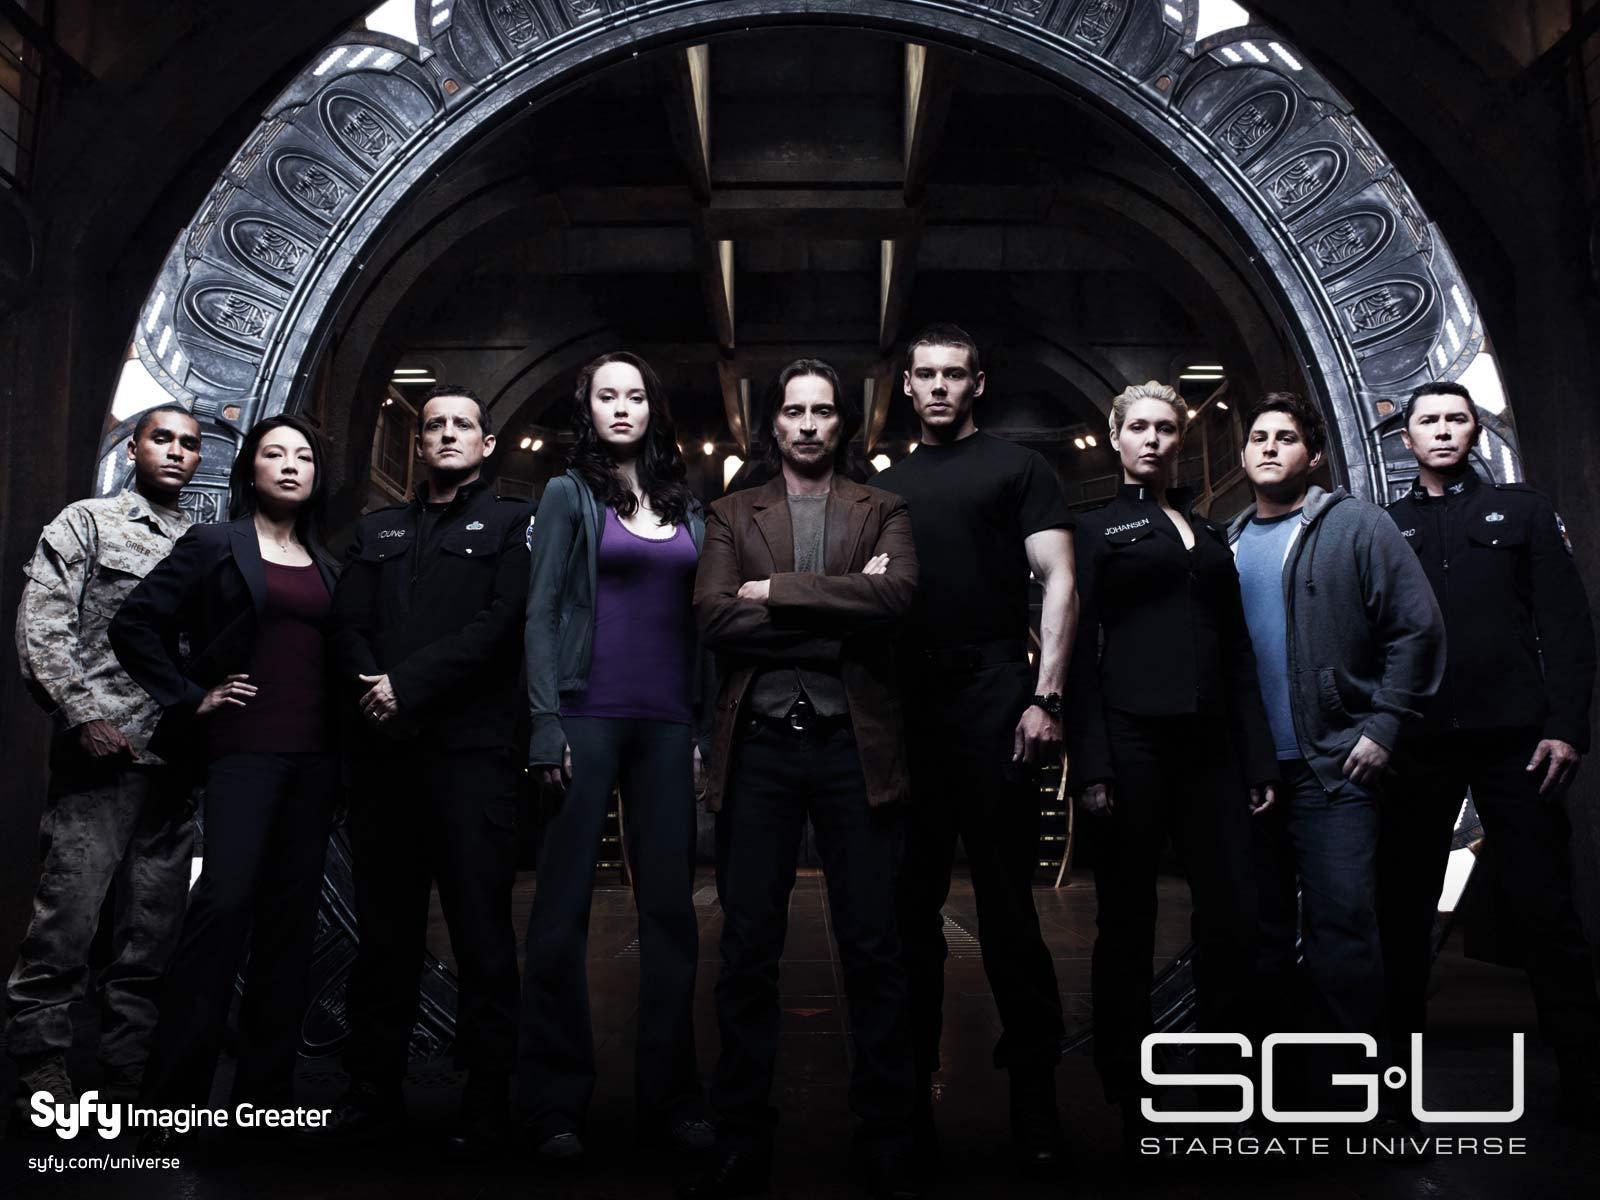 http://3.bp.blogspot.com/-GD5-FmiZd6U/T5spvs4sTwI/AAAAAAAACAU/WUTJYGllvQo/s1600/Stargate-Universe-Wallpaper.jpg